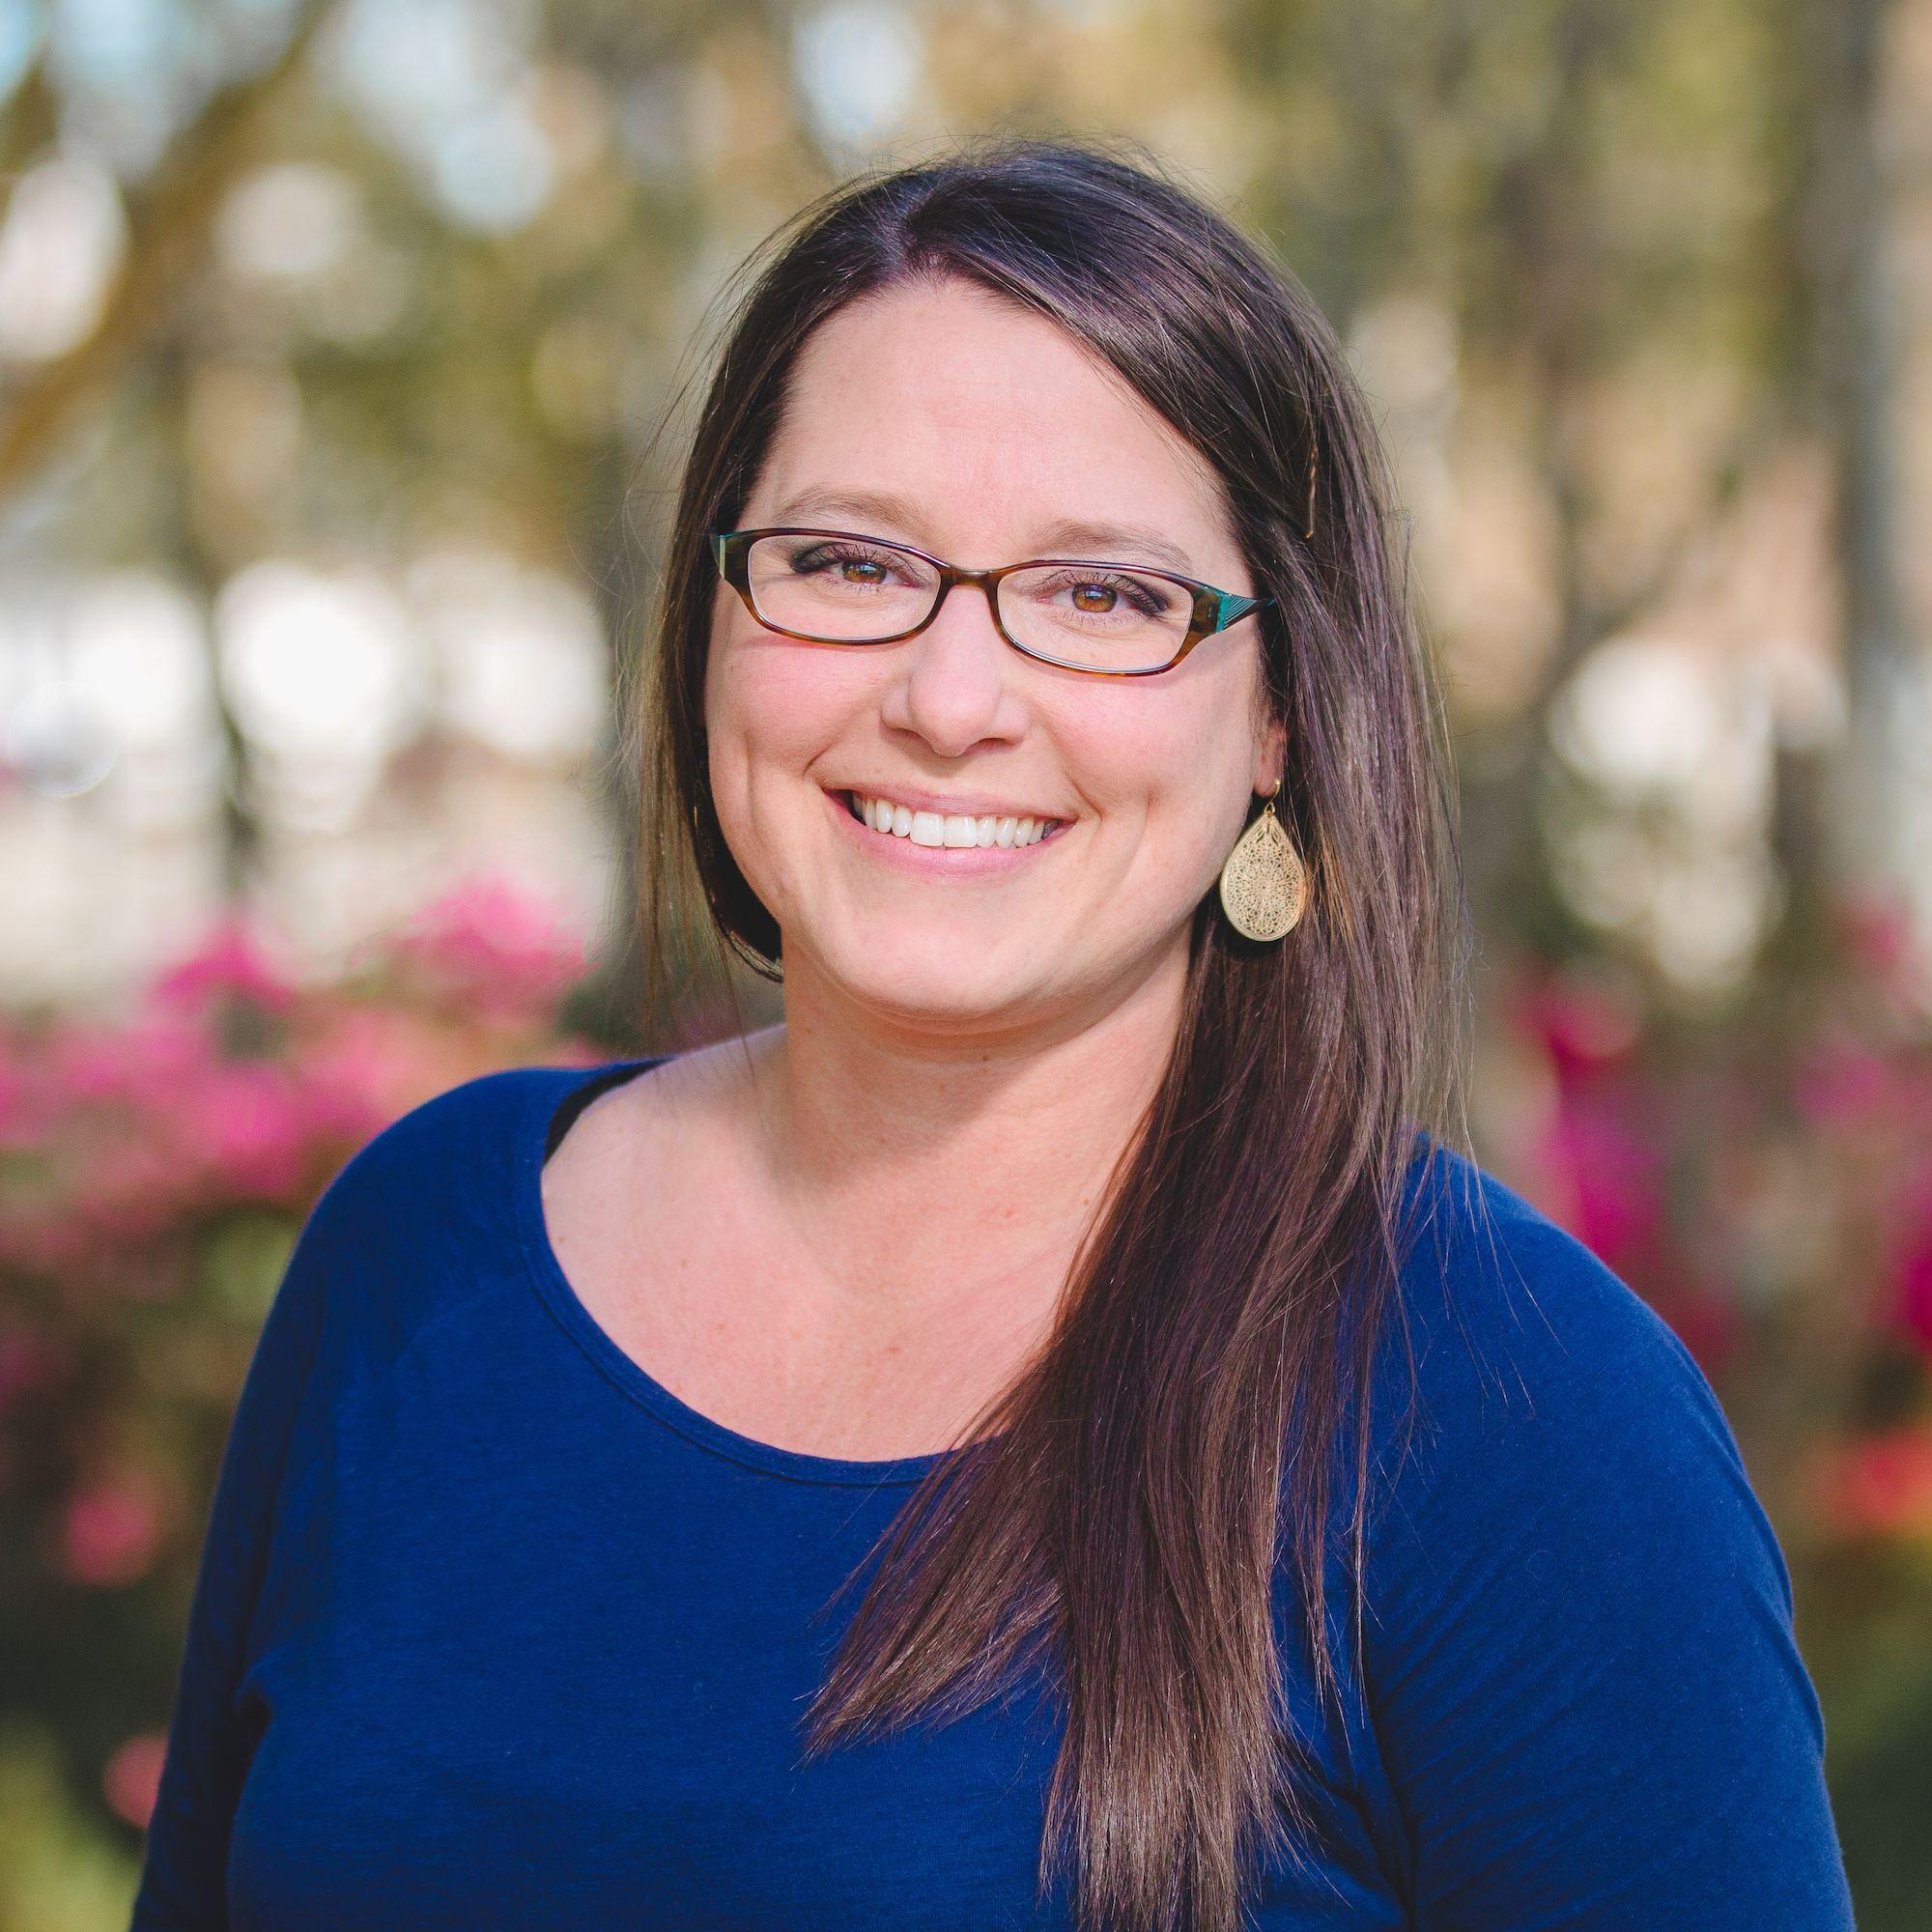 Amanda Matthews, Customer Support Specialist